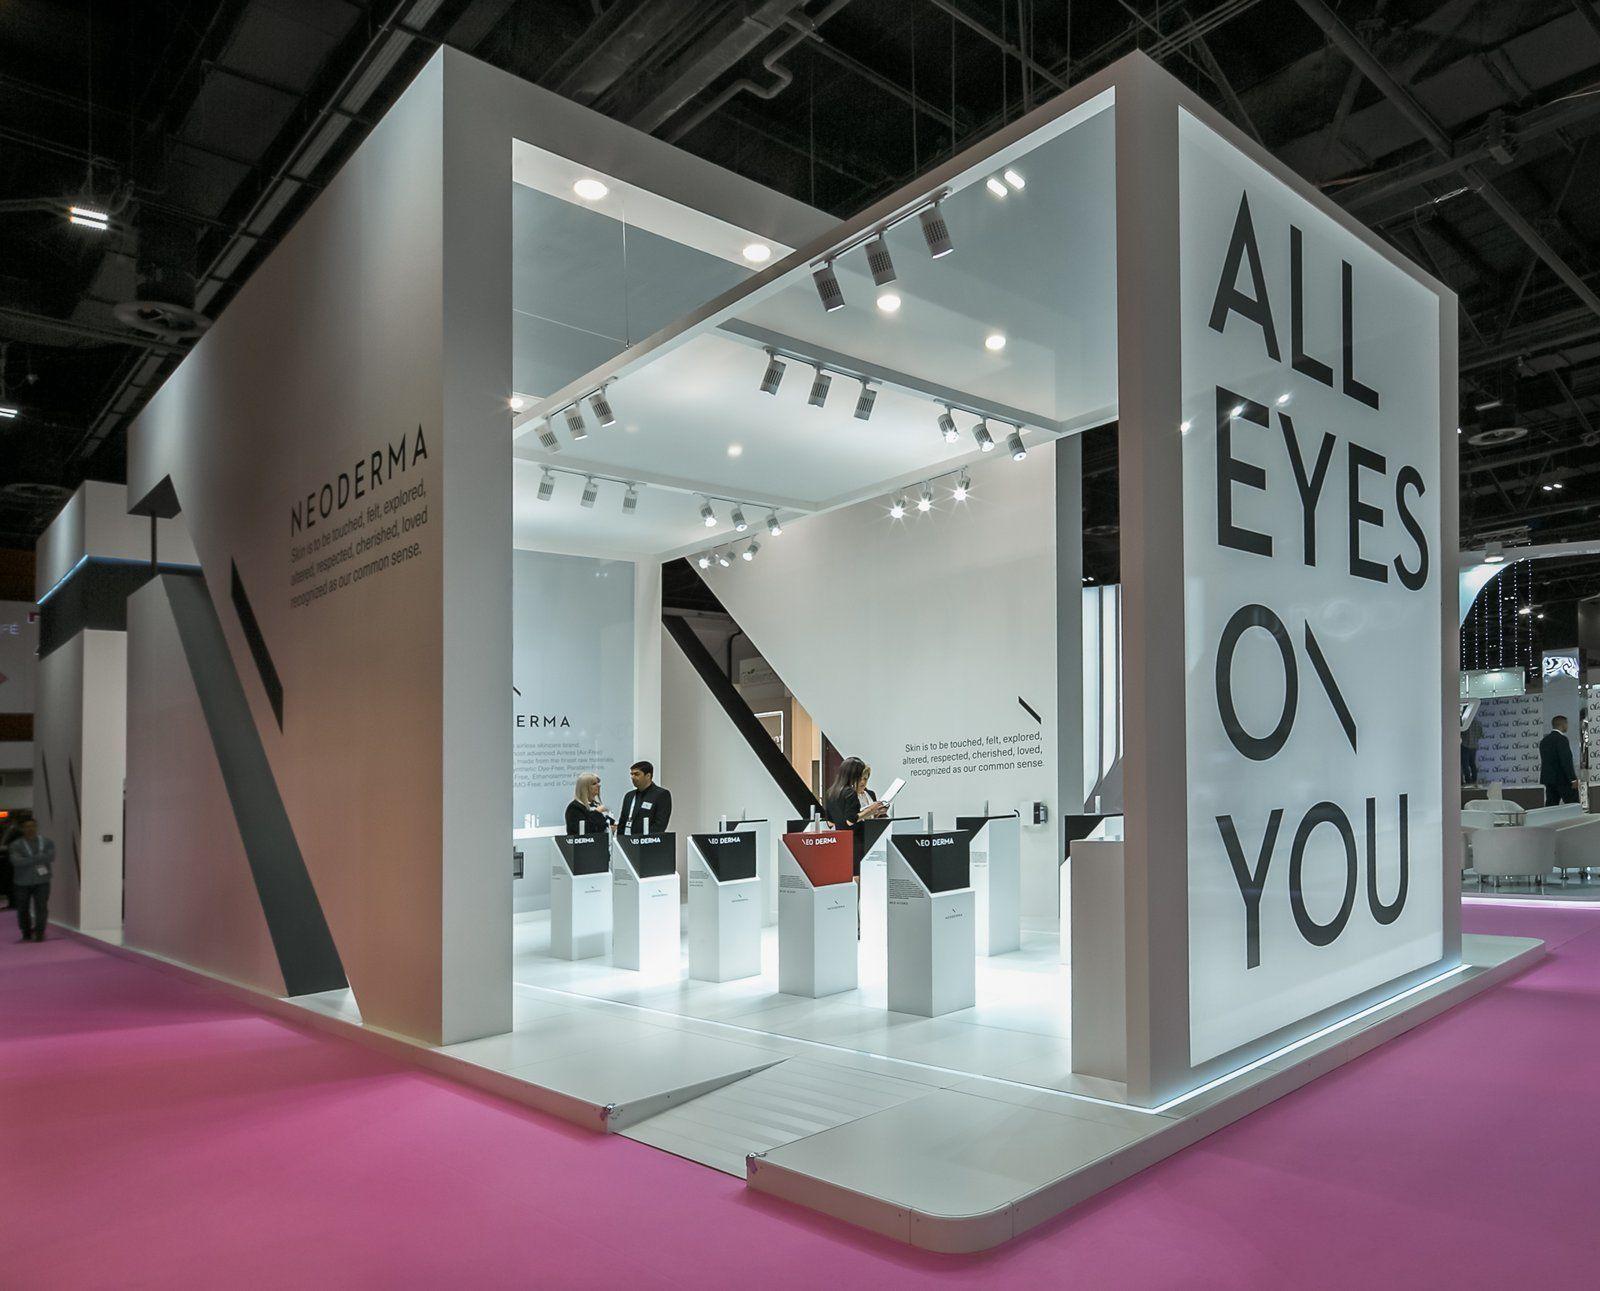 D Printing Dubai Exhibition : Neoderma beauty world middle east dubai mq